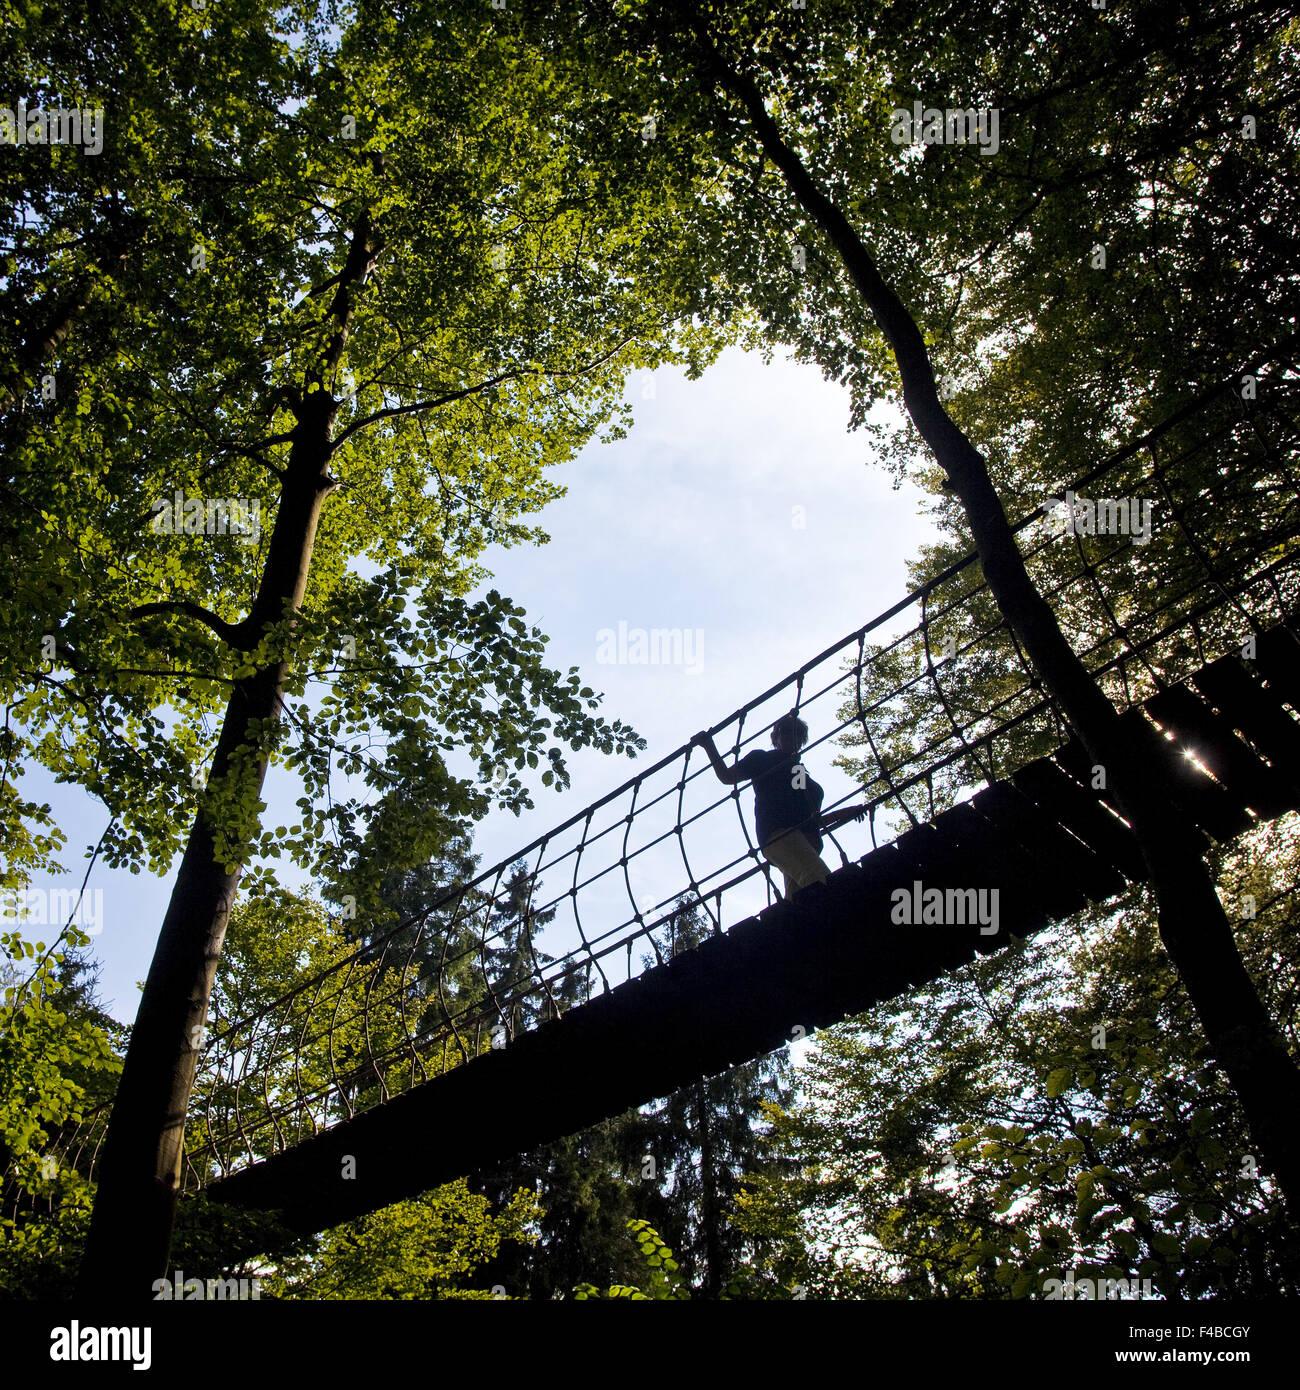 The Adventure Bridge in Bad Berleburg. - Stock Image